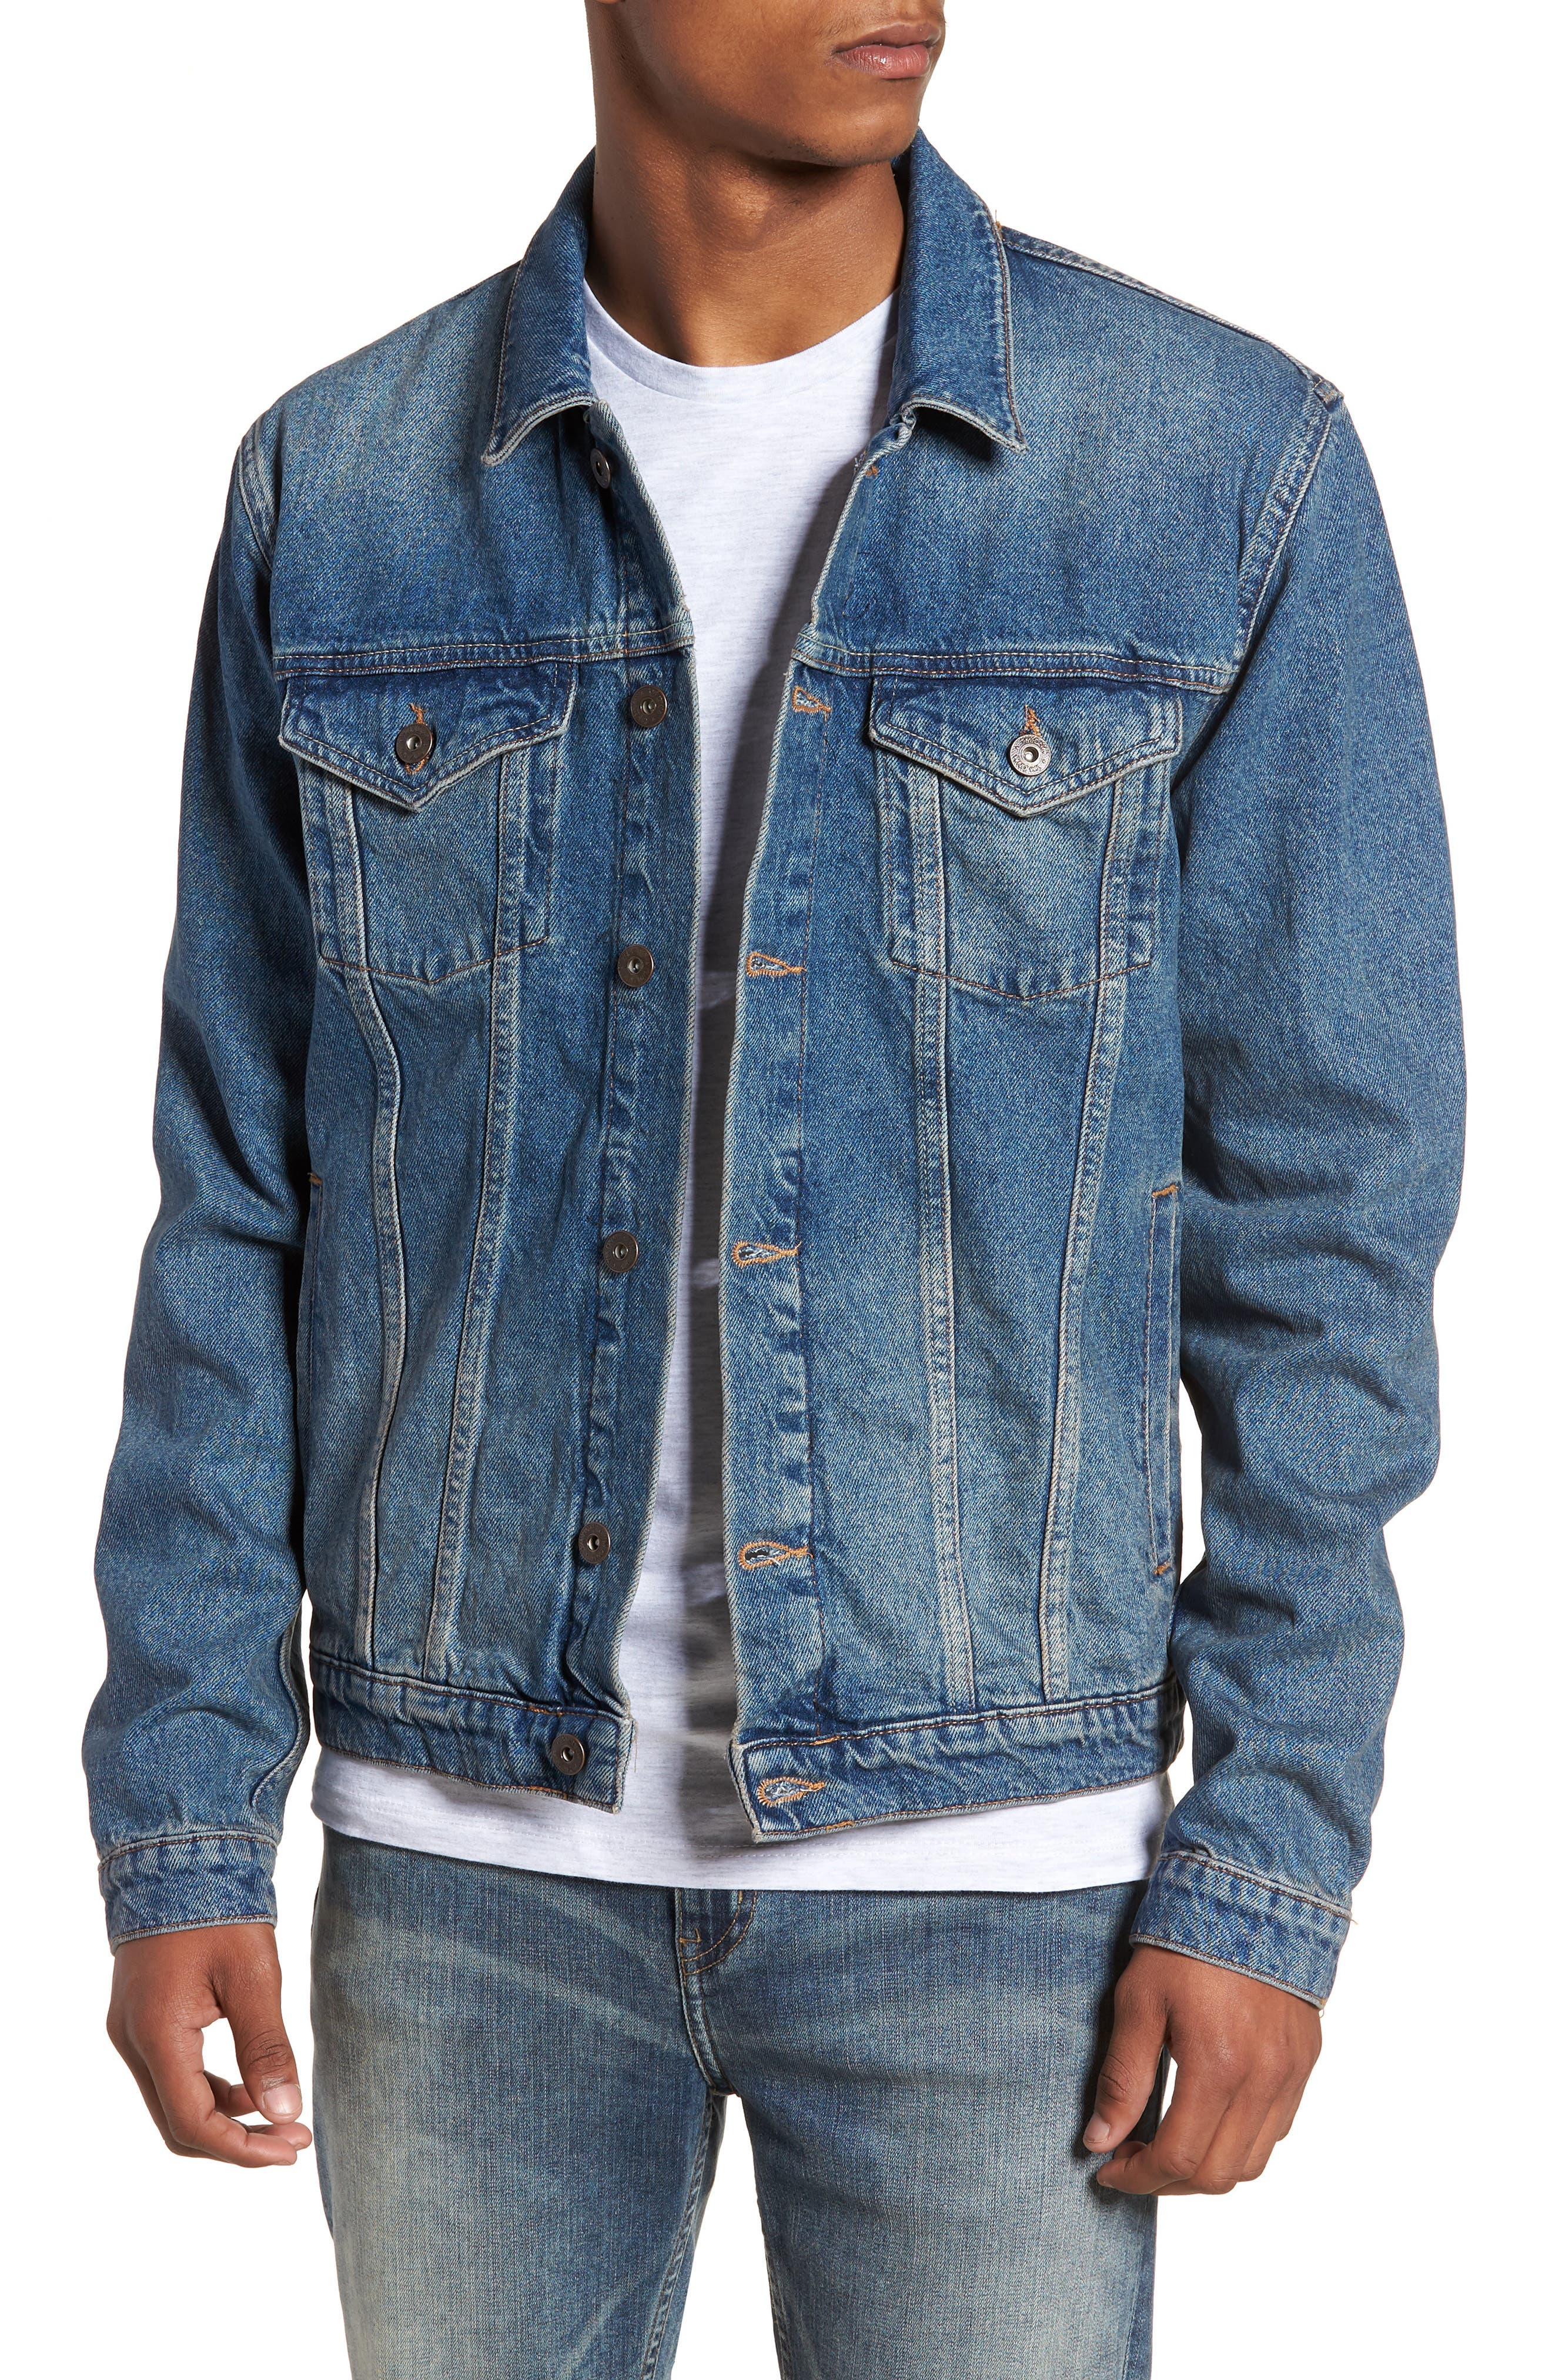 Main Image - Topman Mid Wash Denim Jacket